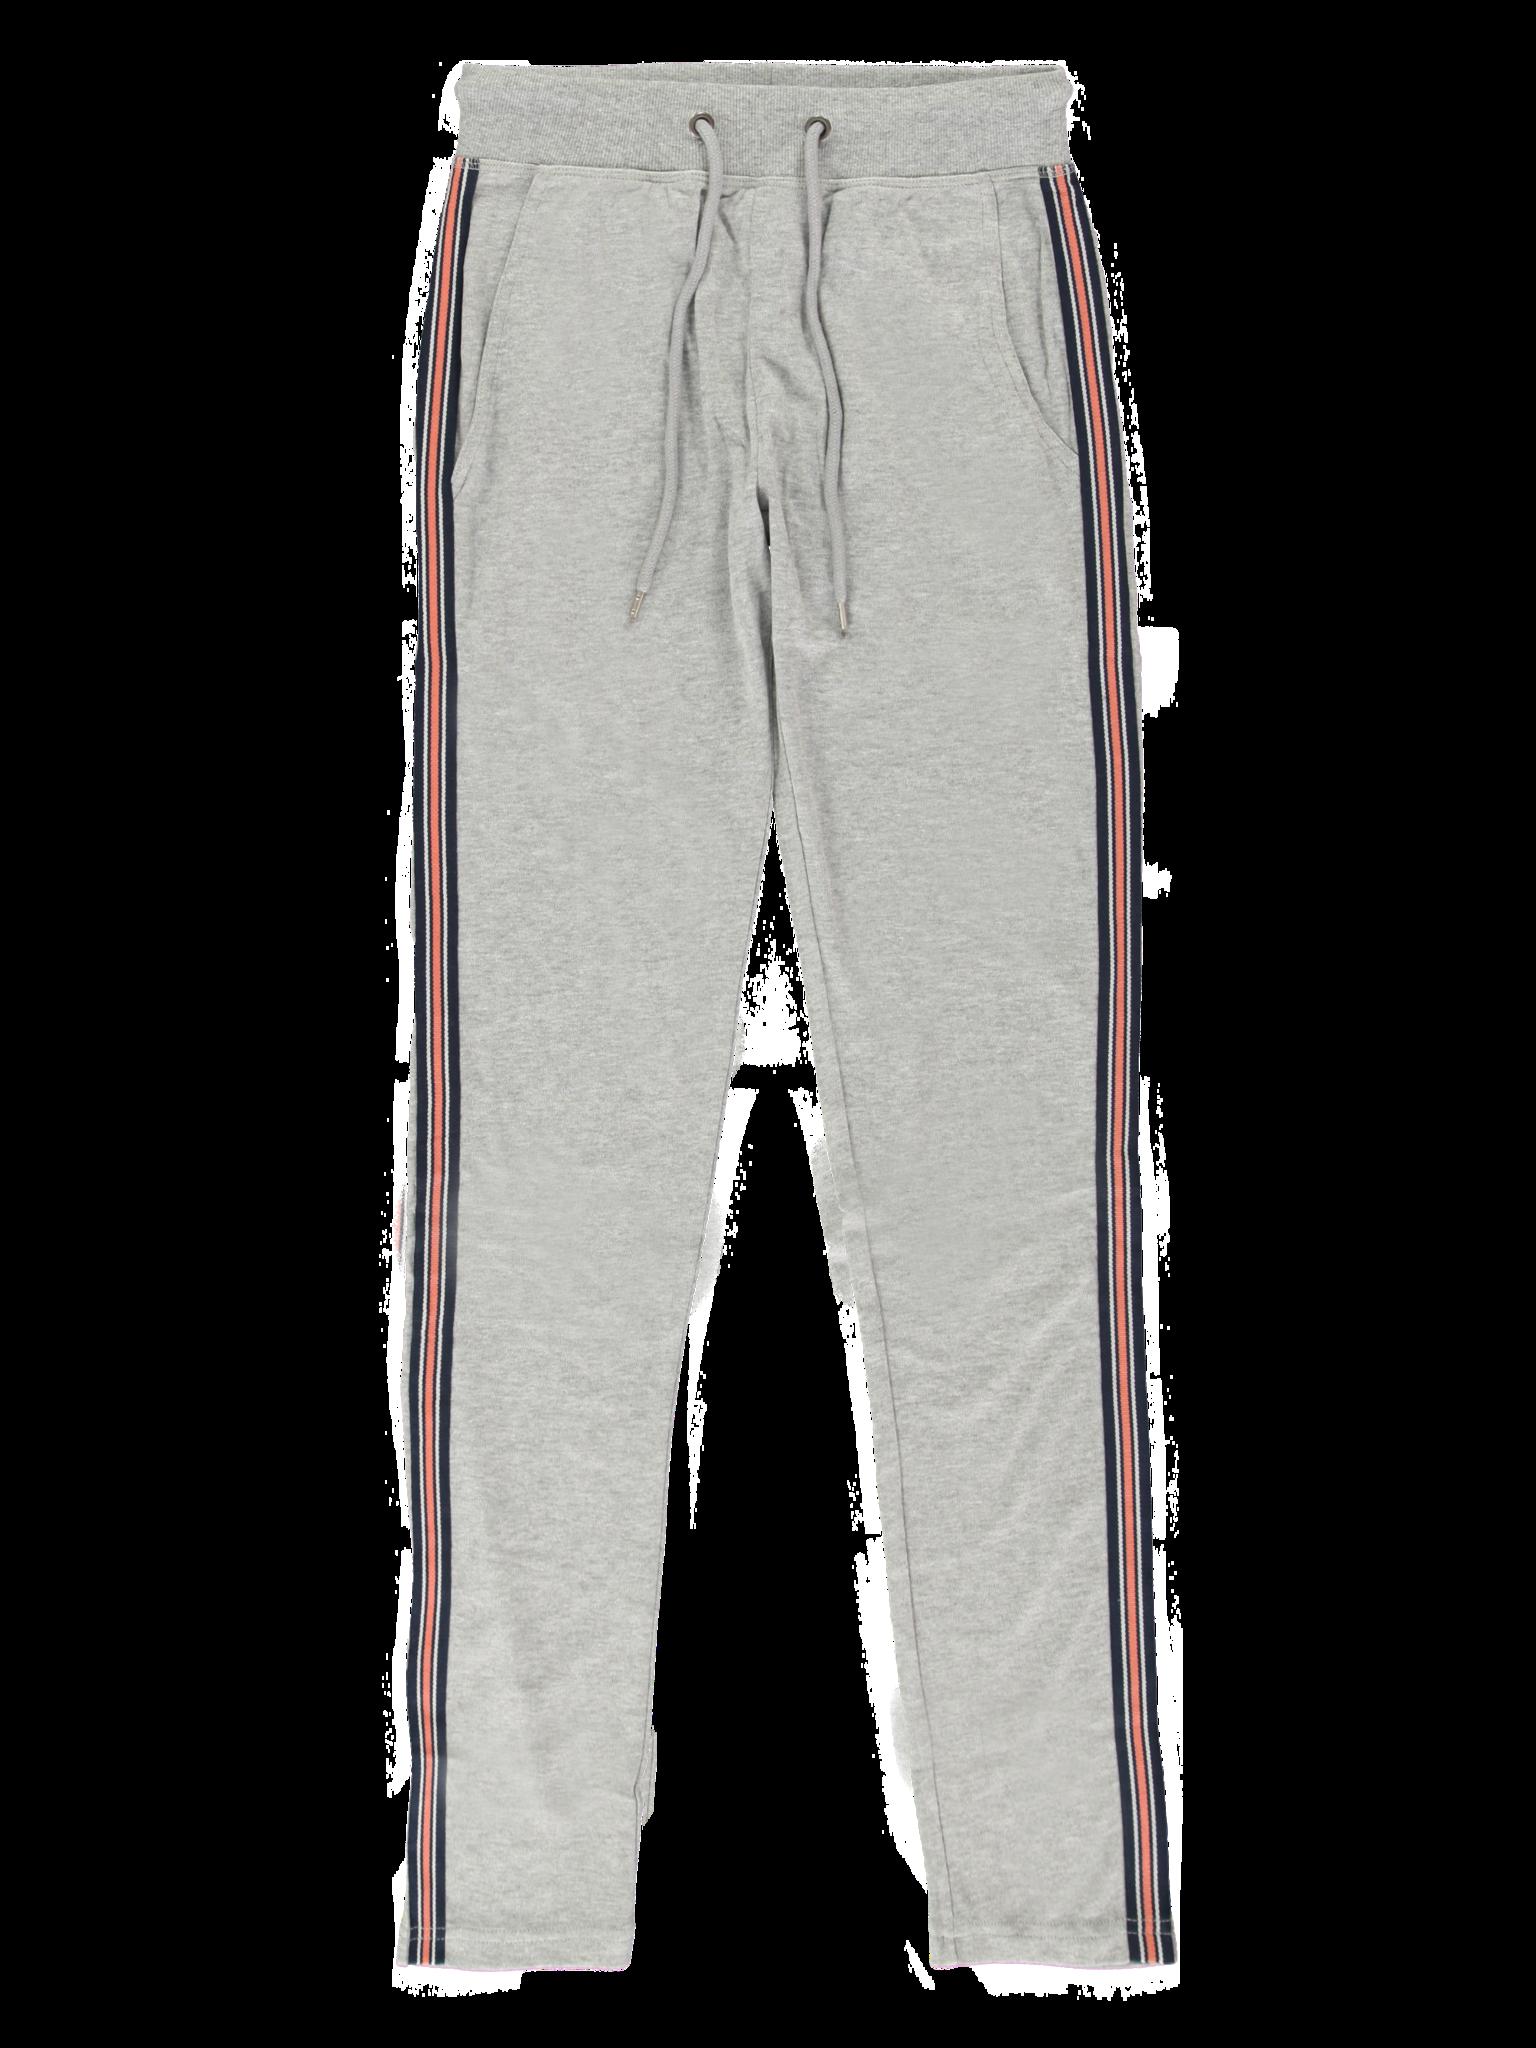 All Brands | Summerproducts Ladies | Jogging Pant | 18 pcs/box